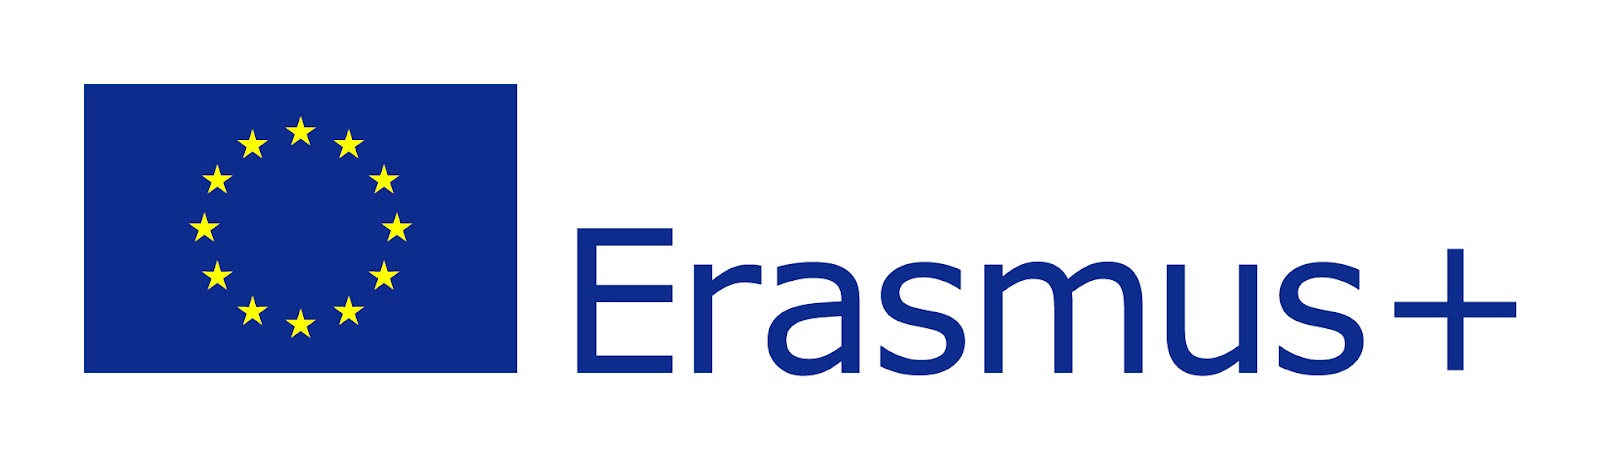 EU flag-Erasmus+_vect_POS (1).jpg